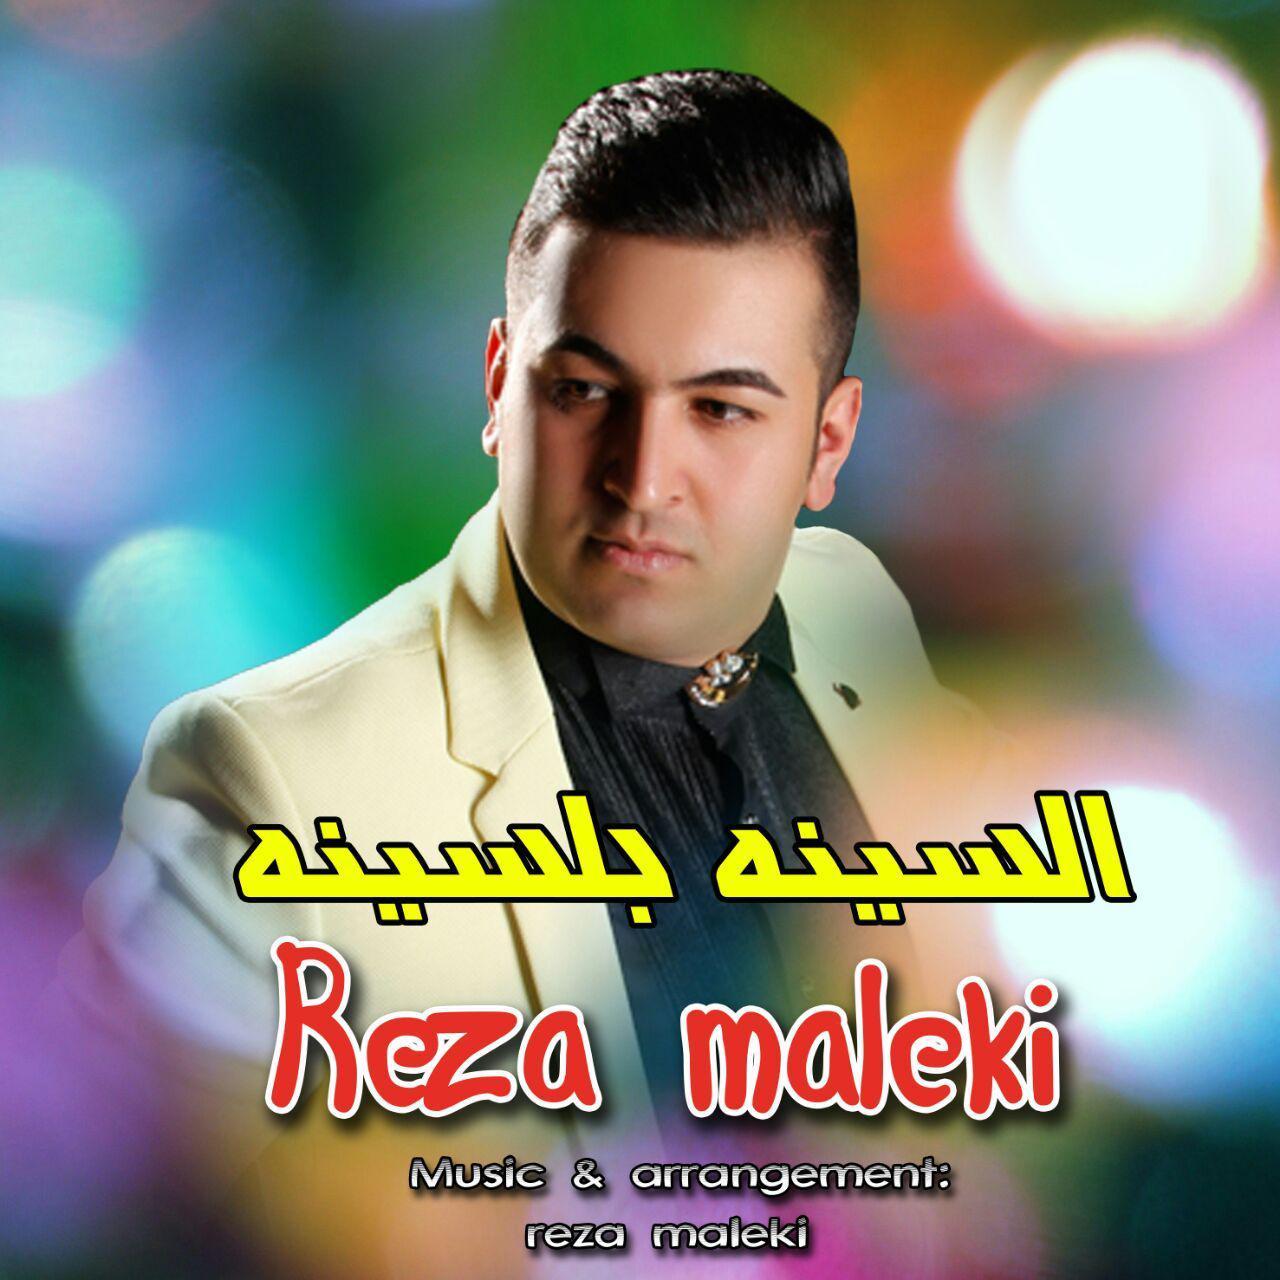 http://s5.picofile.com/file/8369710192/05Reza_Maleki_Elasina_Belasine.jpg